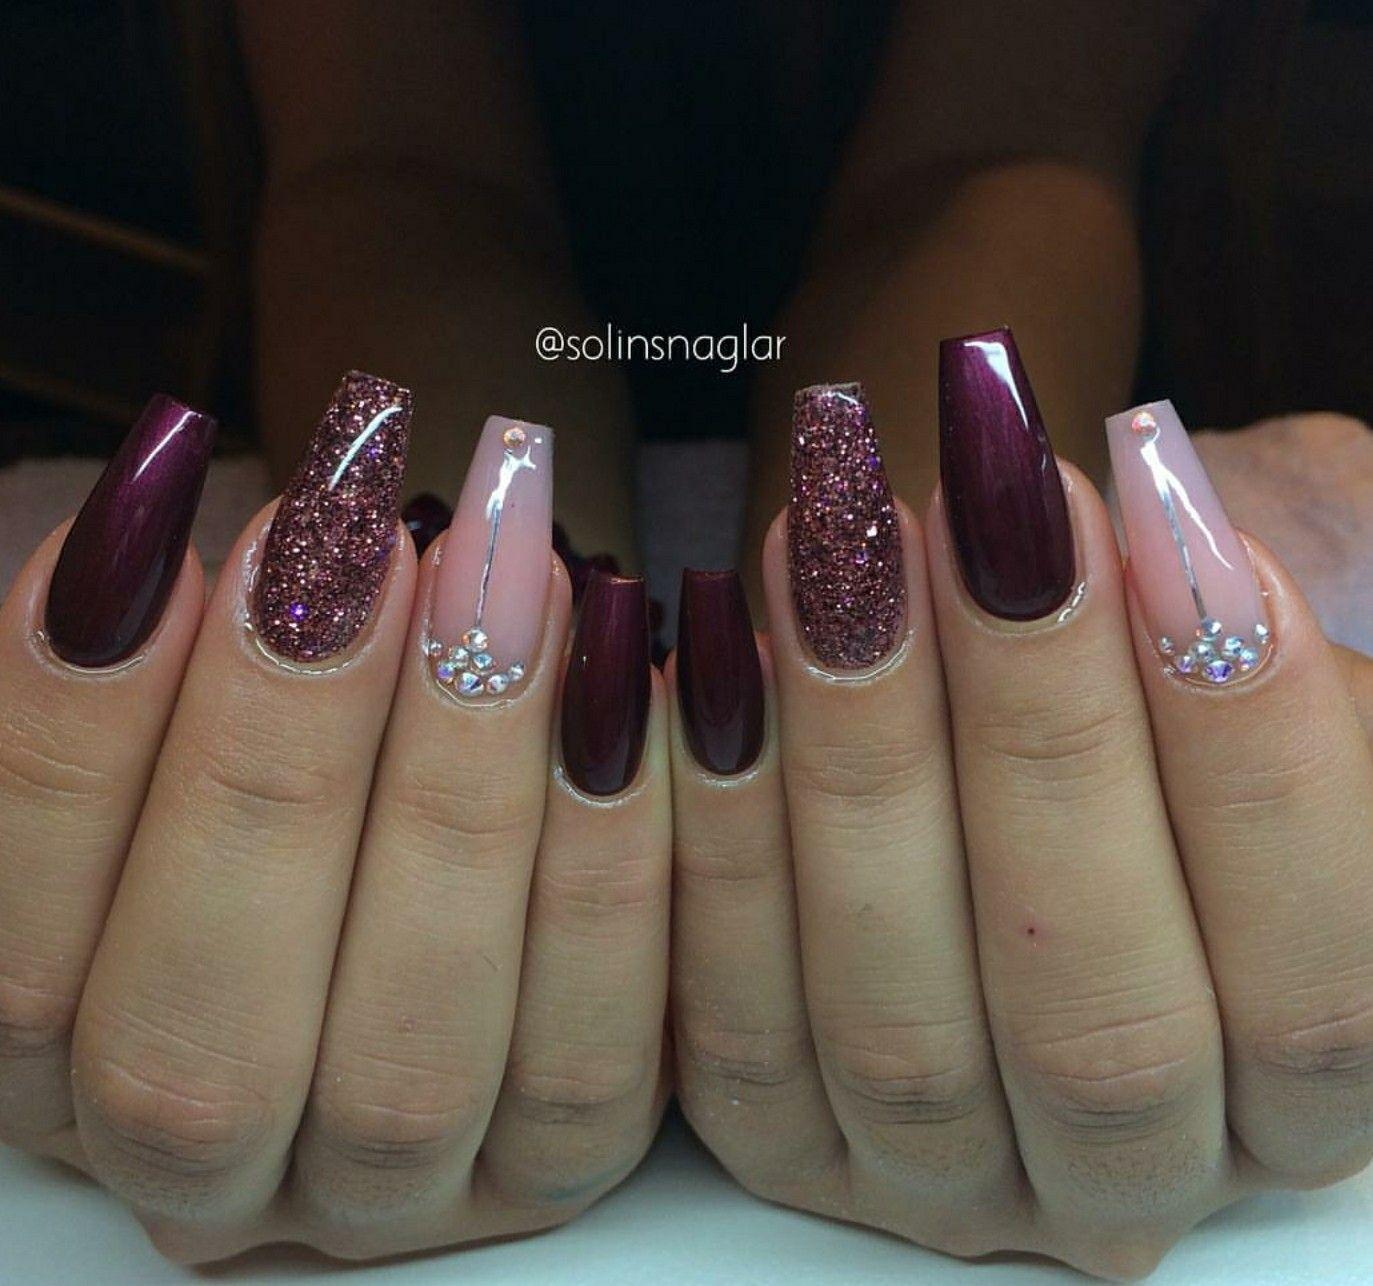 Ballerina Nails Pink And Burgundy Nails Burgundy Glitter Nails Nails With Rhinestones Acrylic Nails Burgundy Acrylic Nails Burgundy Nails Ballerina Nails